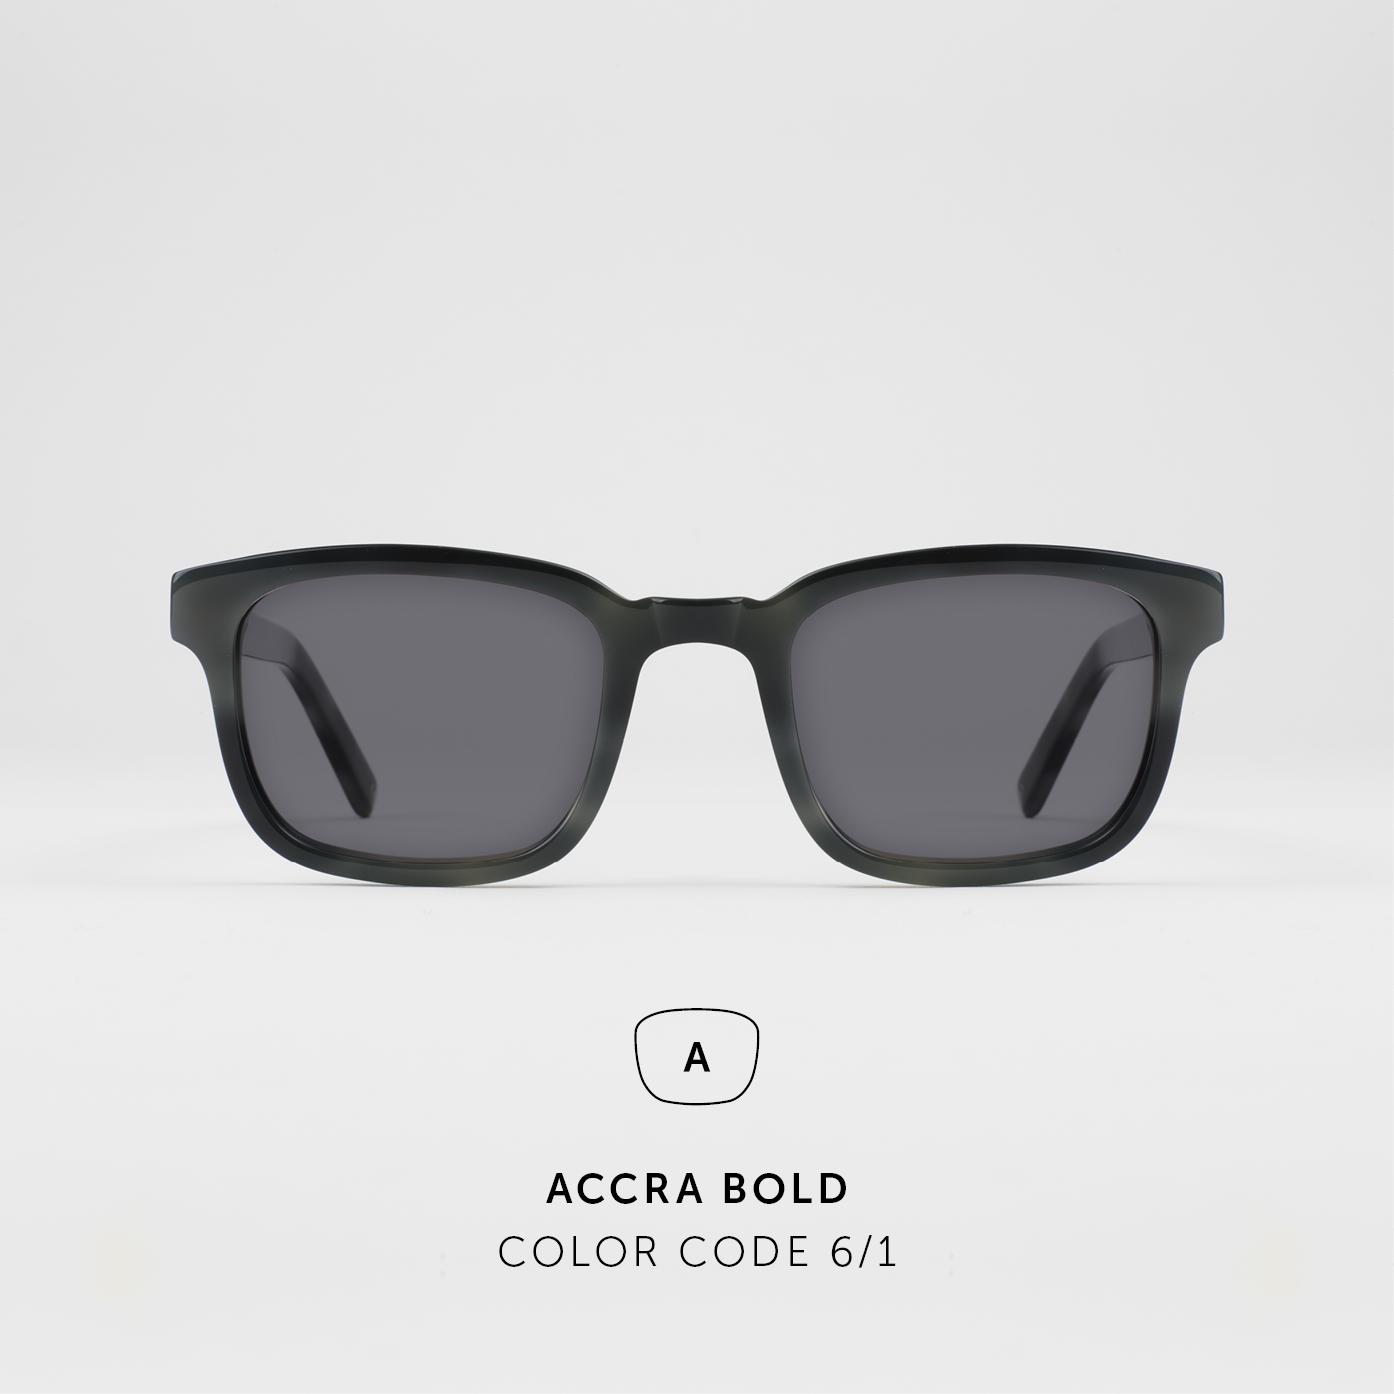 AccraBold22.jpg